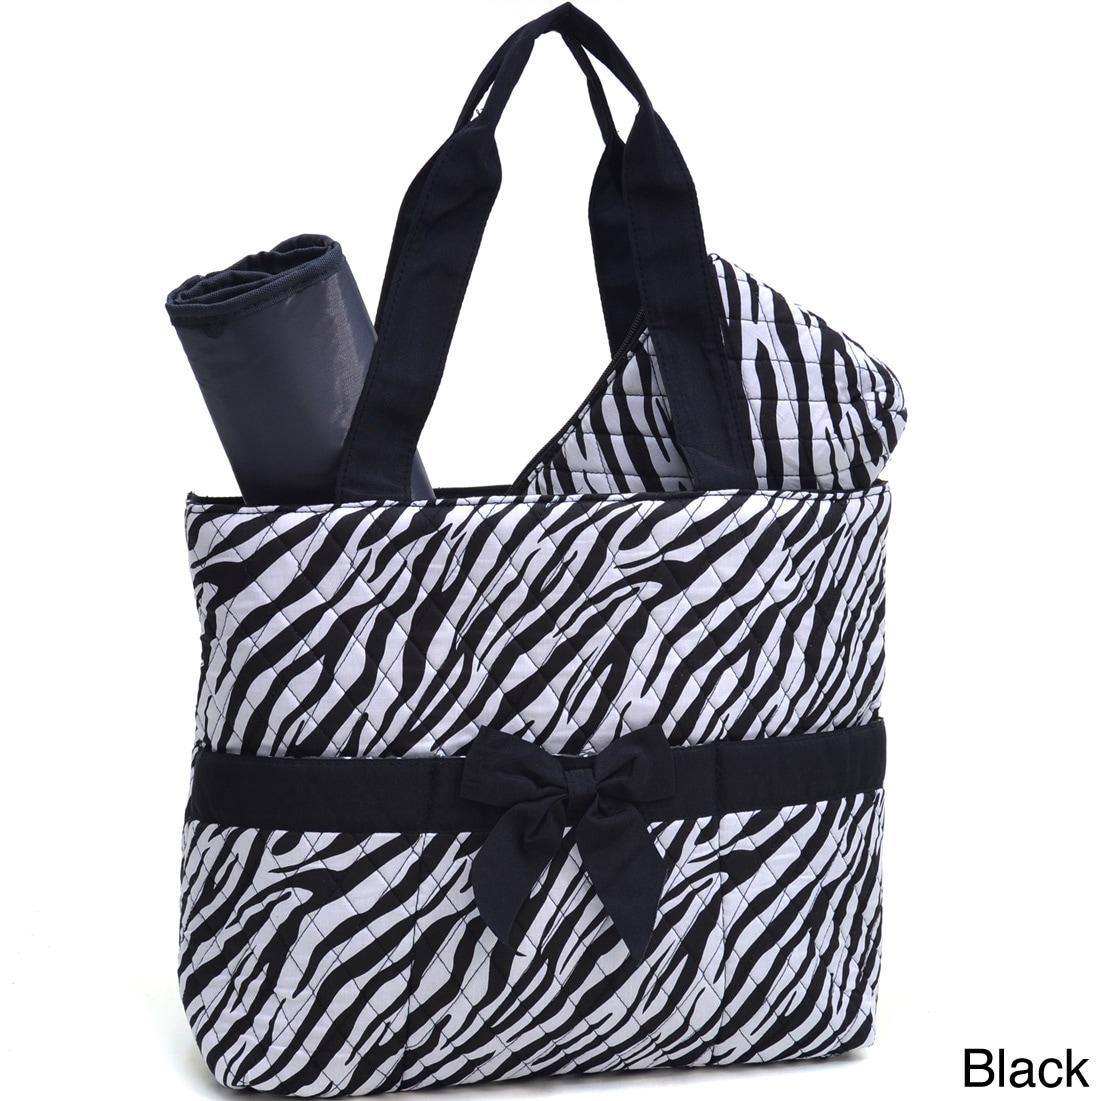 Dasein Rosen Blue Zebra Print 3-piece Diaper Bag Set (Bla...